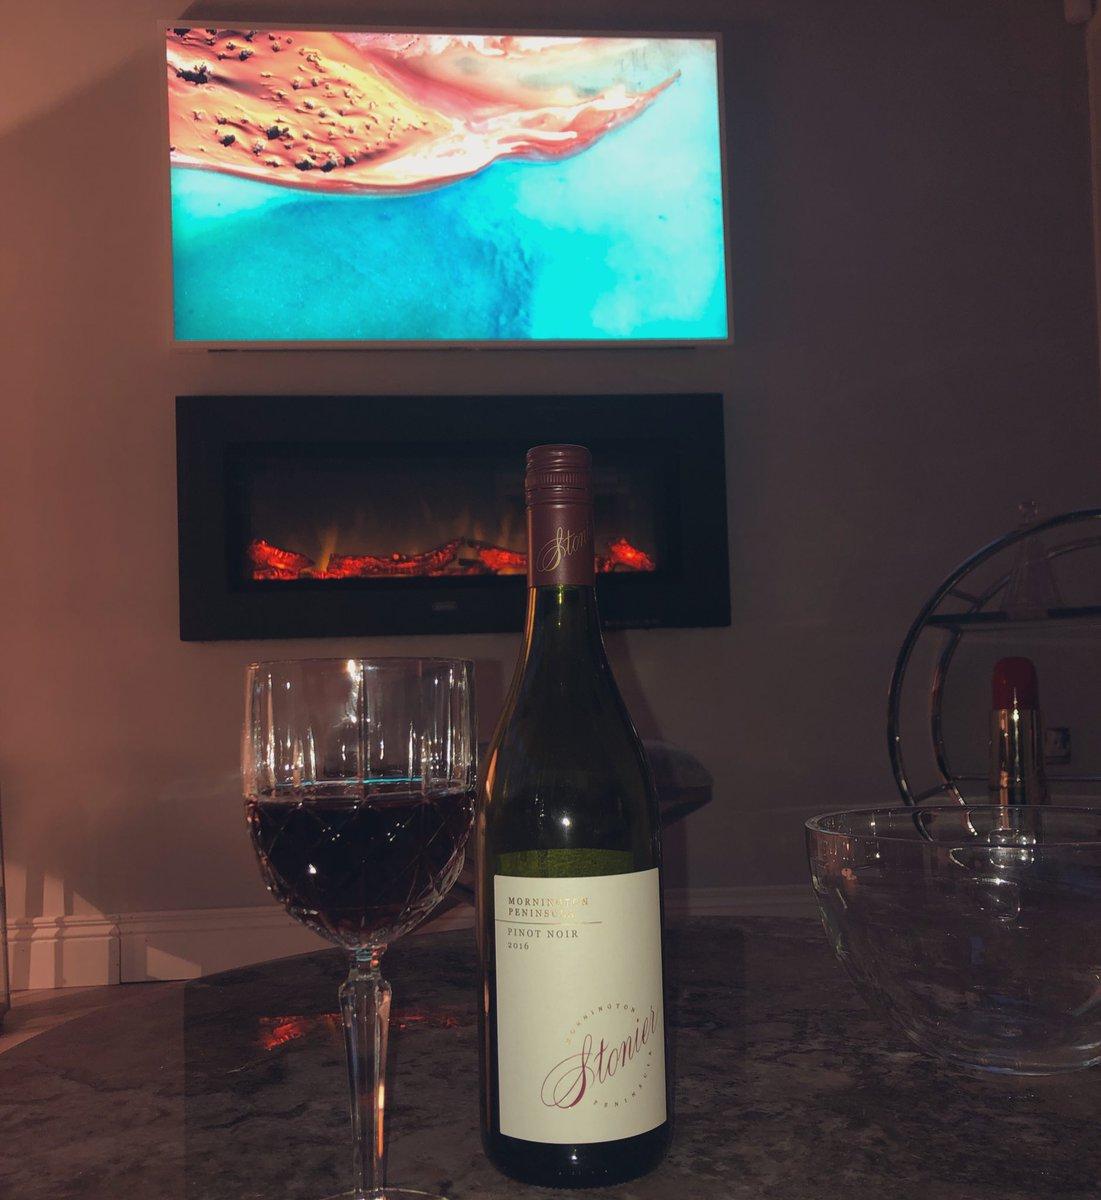 #winewednesday with this @StonierWines Pinot Noir from the Mornington Peninsula 🇦🇺🍷 (@AaronKeenann) https://t.co/qPbQfeeIlq